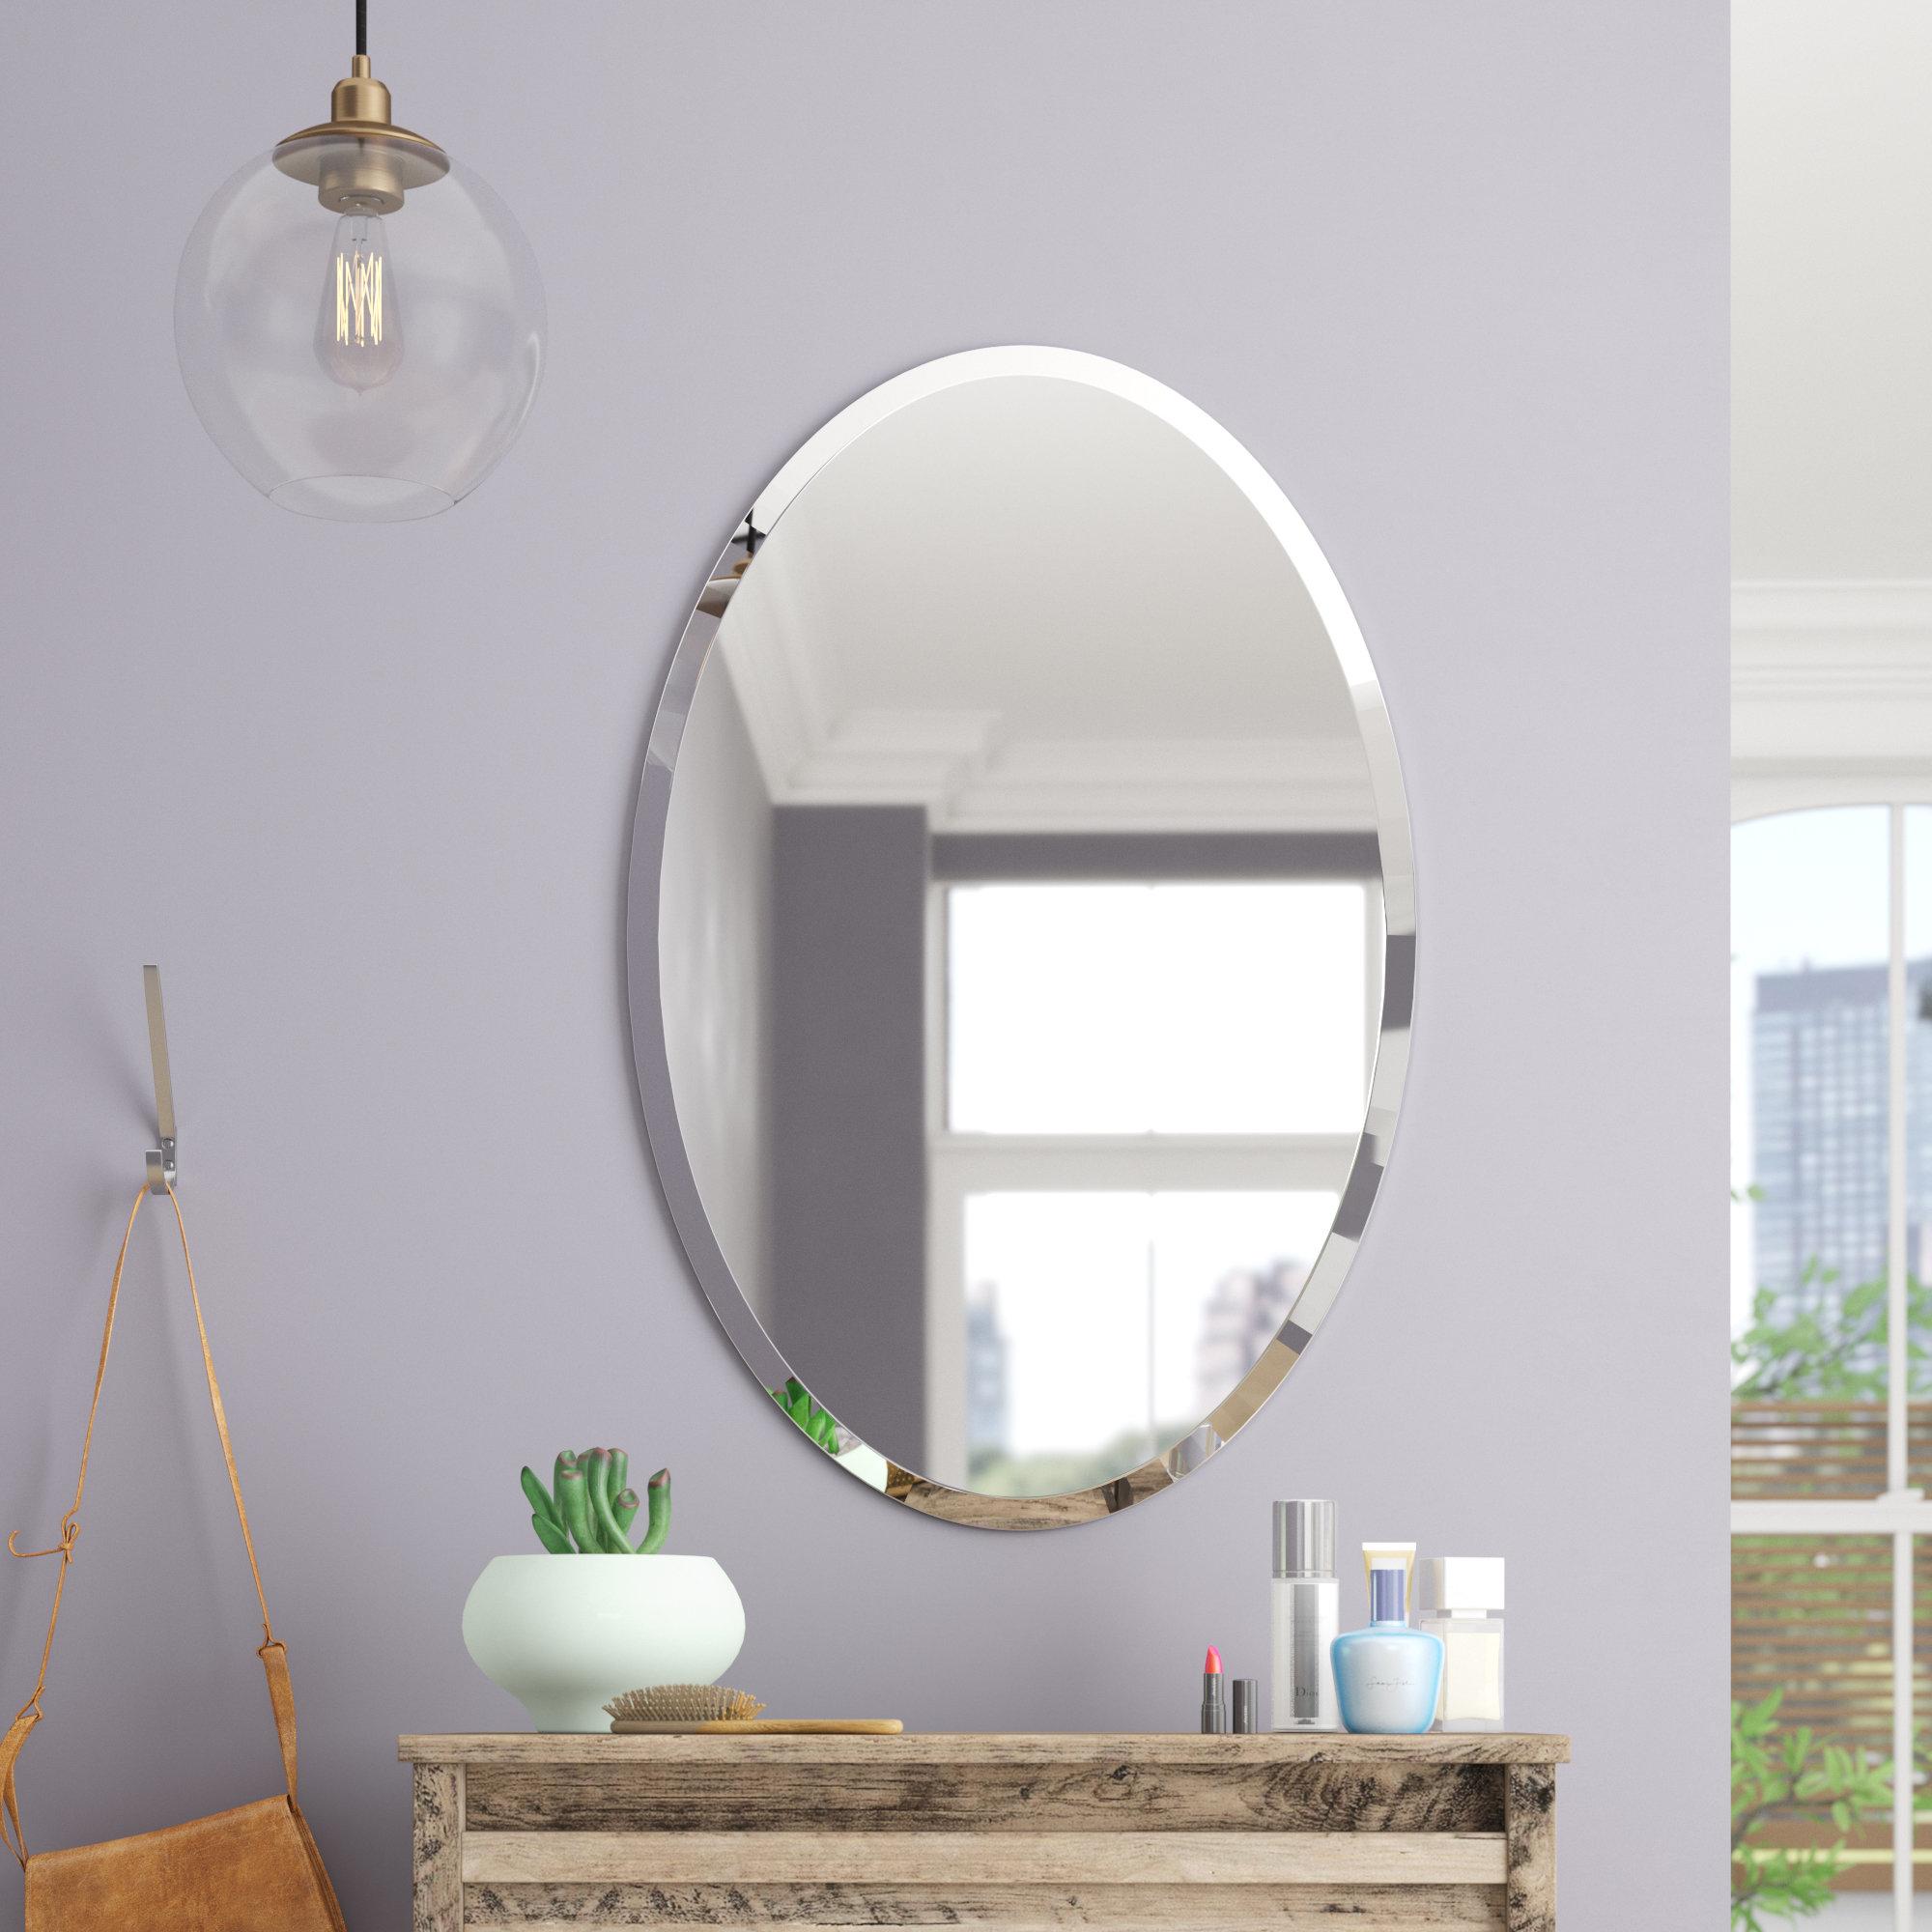 Brayden Studio Thornbury Oval Bevel Frameless Wall Mirror Within Sajish Oval Crystal Wall Mirrors (View 4 of 20)